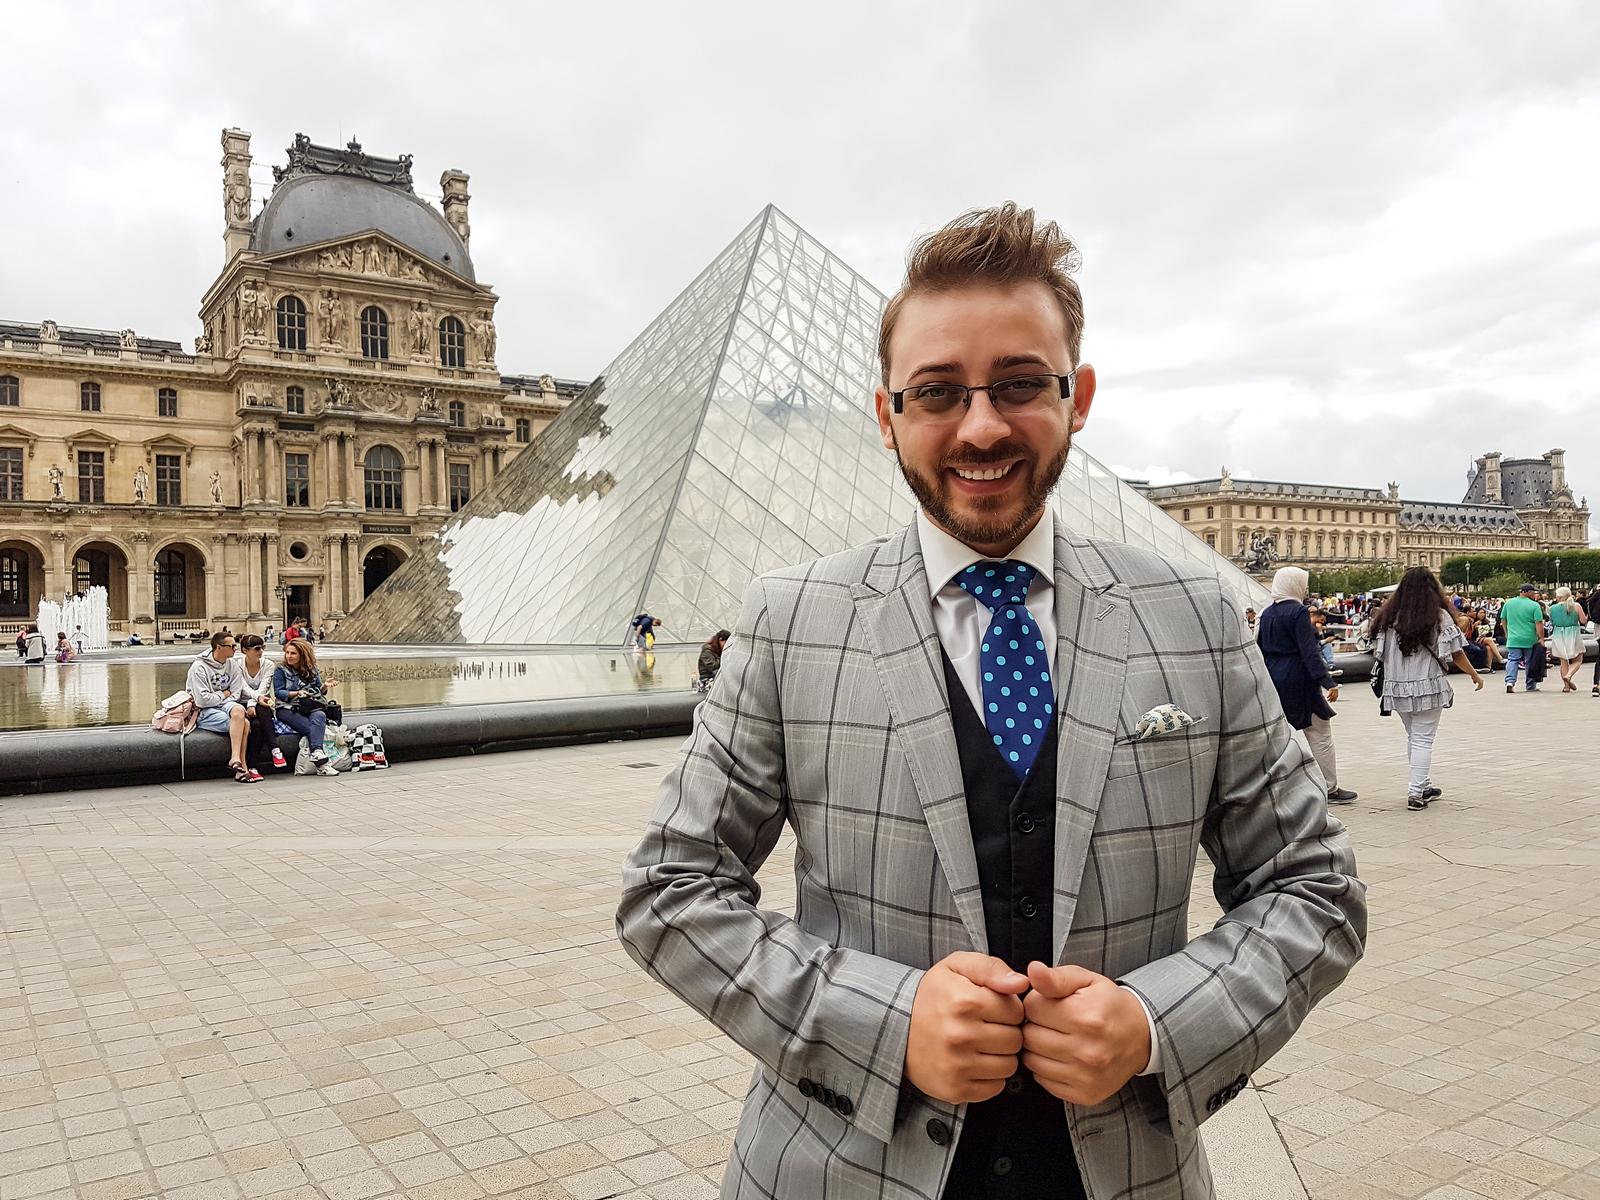 Paris Haute Couture Fashion Week, July 2017, Day 1